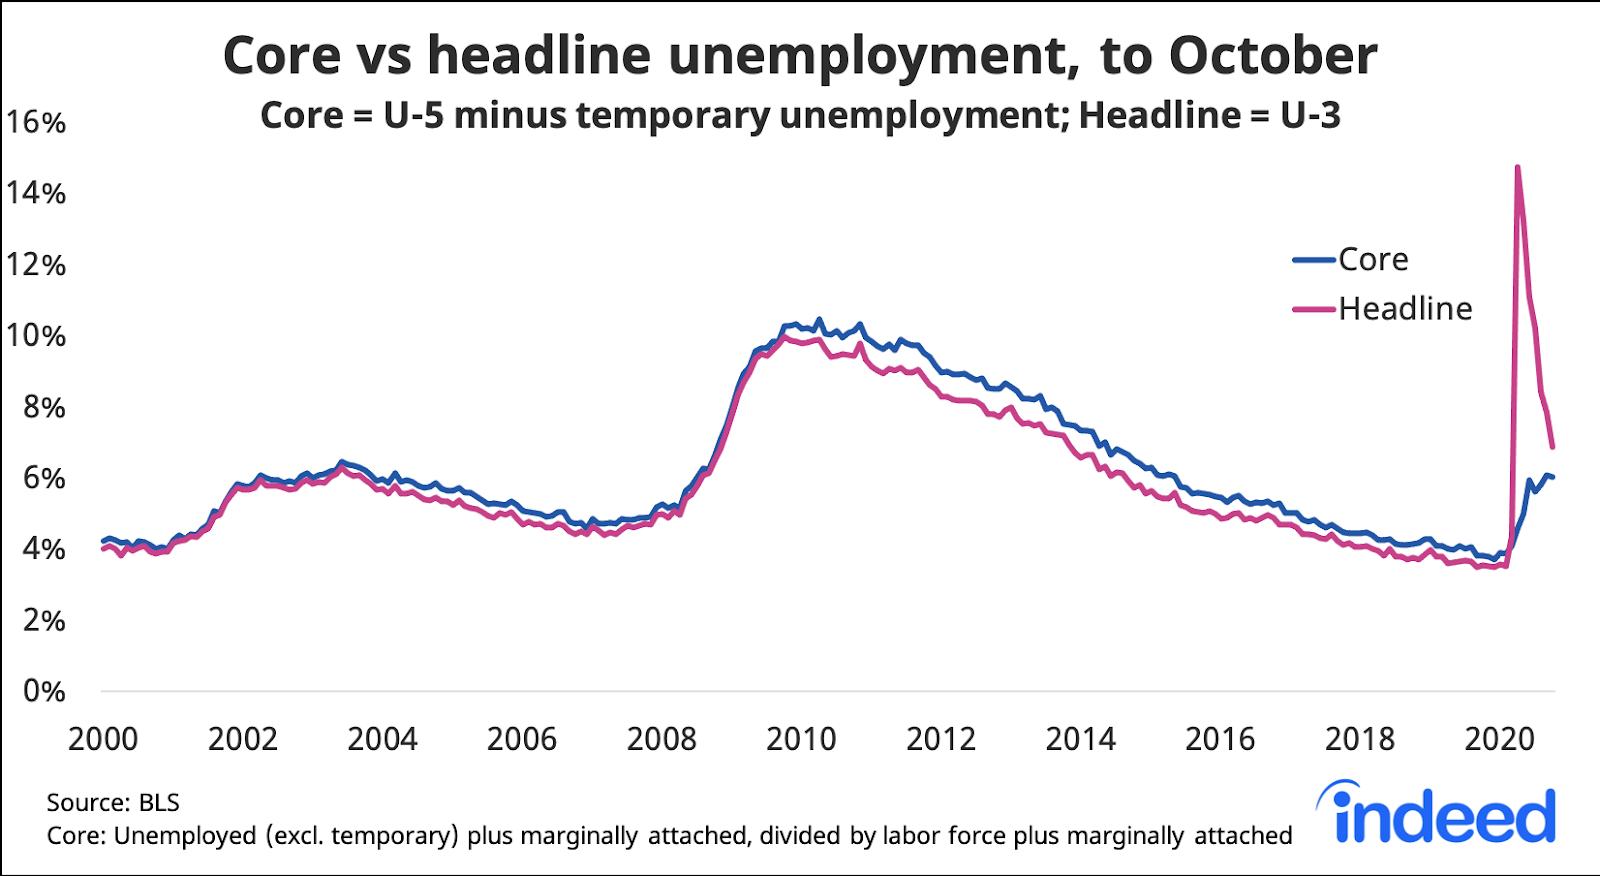 line graph showing core vs headline unemployment, to October 2020